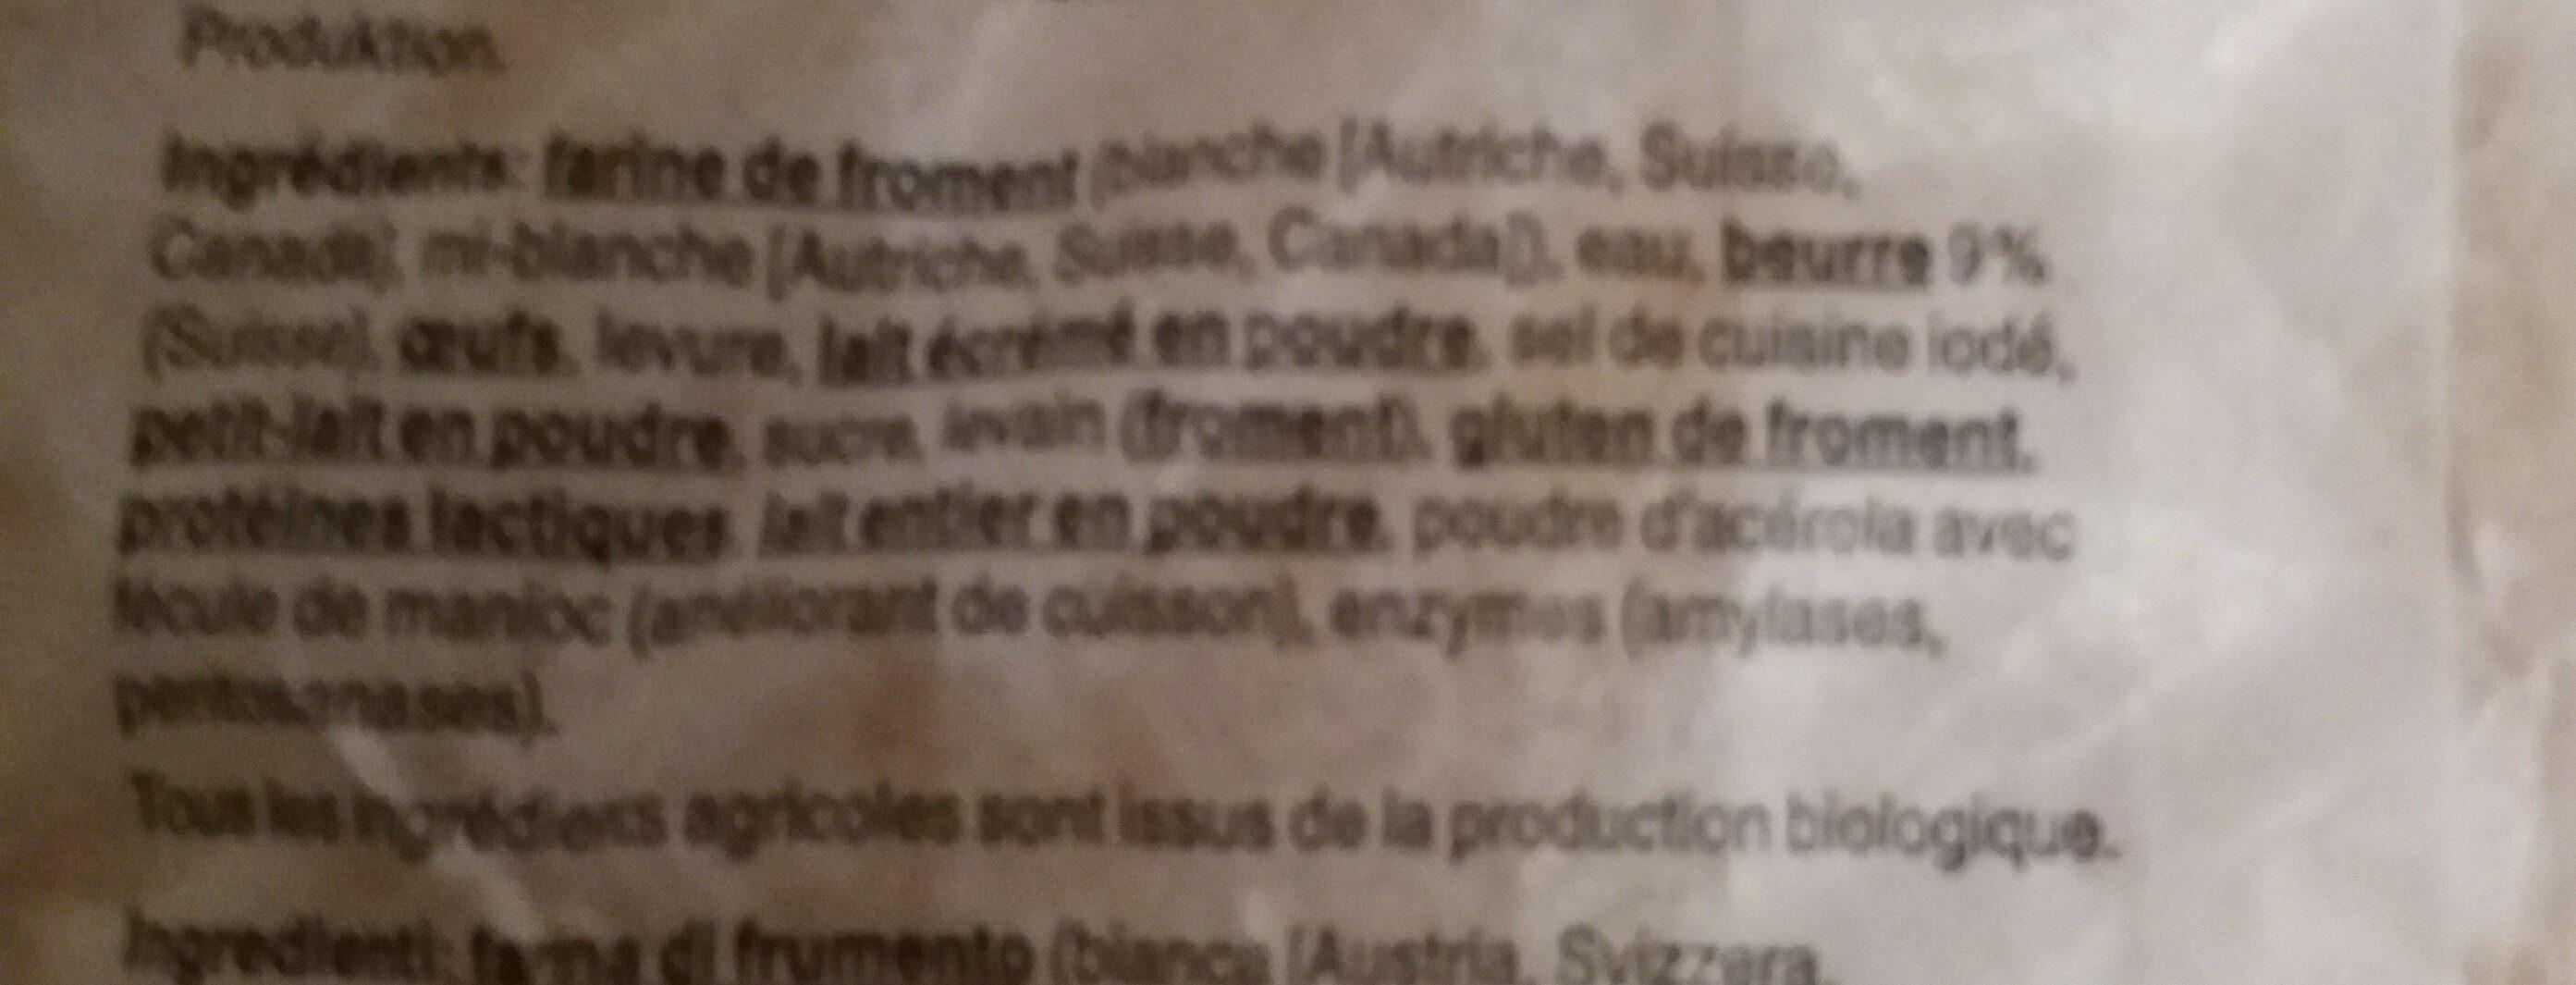 Tresse au beurre bio - Ingredients